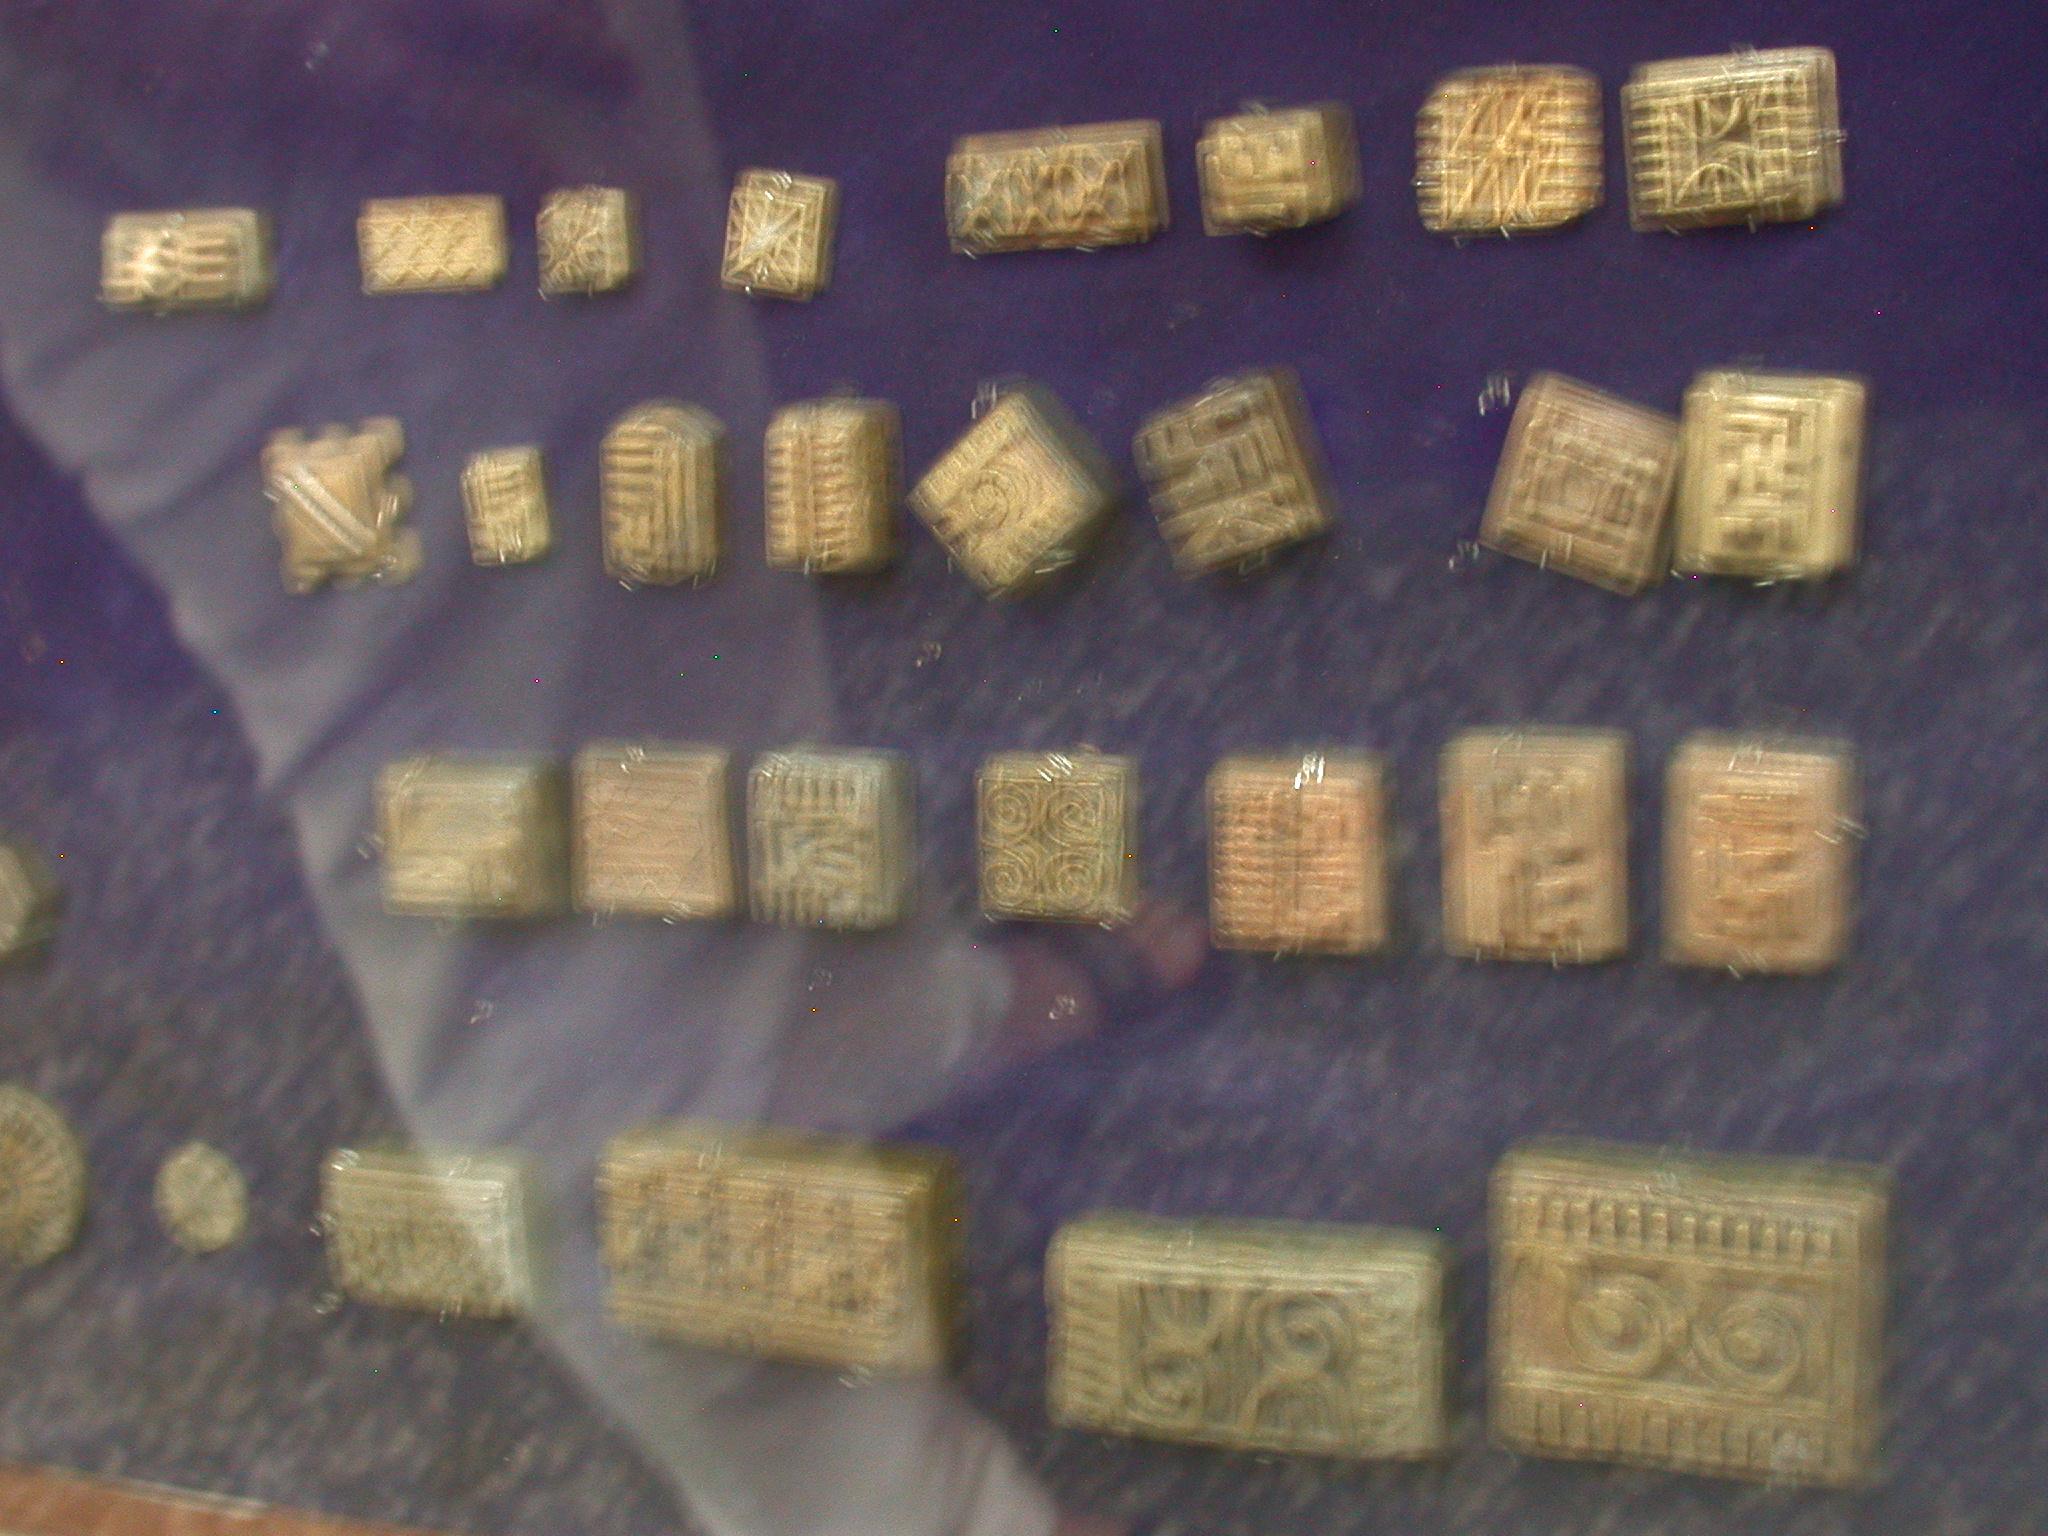 Blurry Brass Ashanti Asante Gold Weights, National Museum, Accra, Ghana